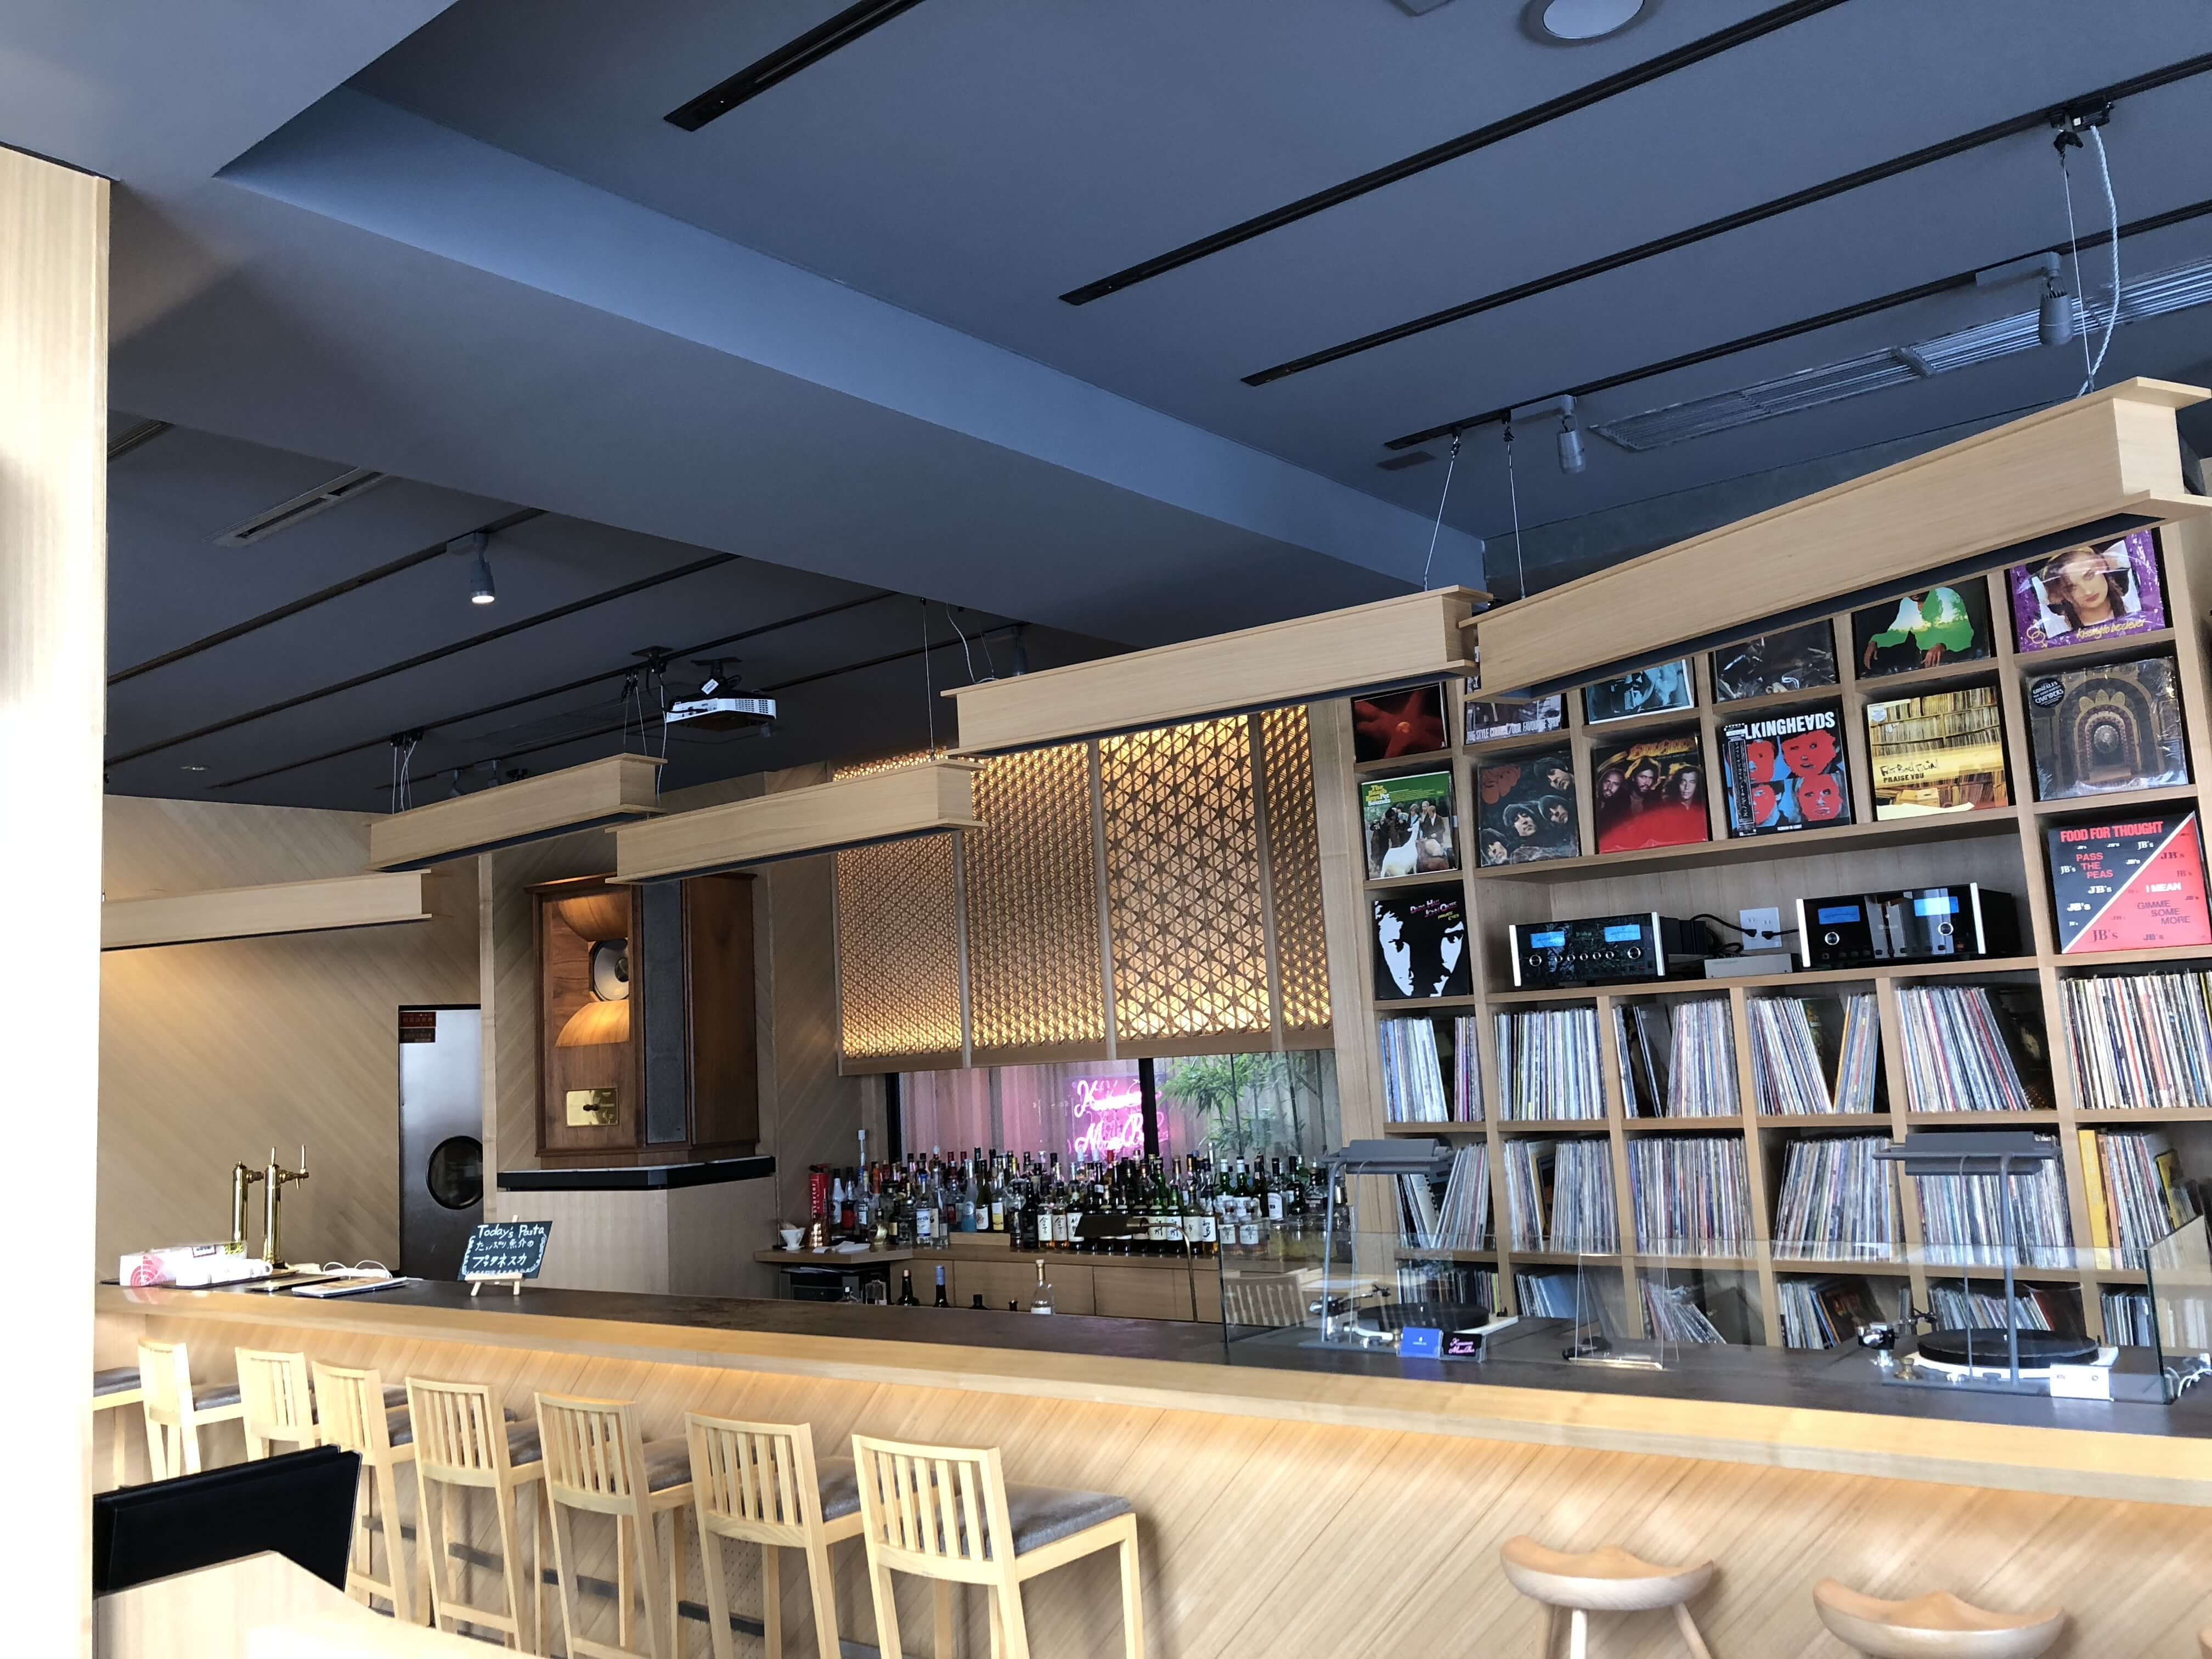 「Kanazawa Music Bar 」竪町ストリートで一際オシャレなホテル「KANAME INN」内にあるBarでゆったりランチ